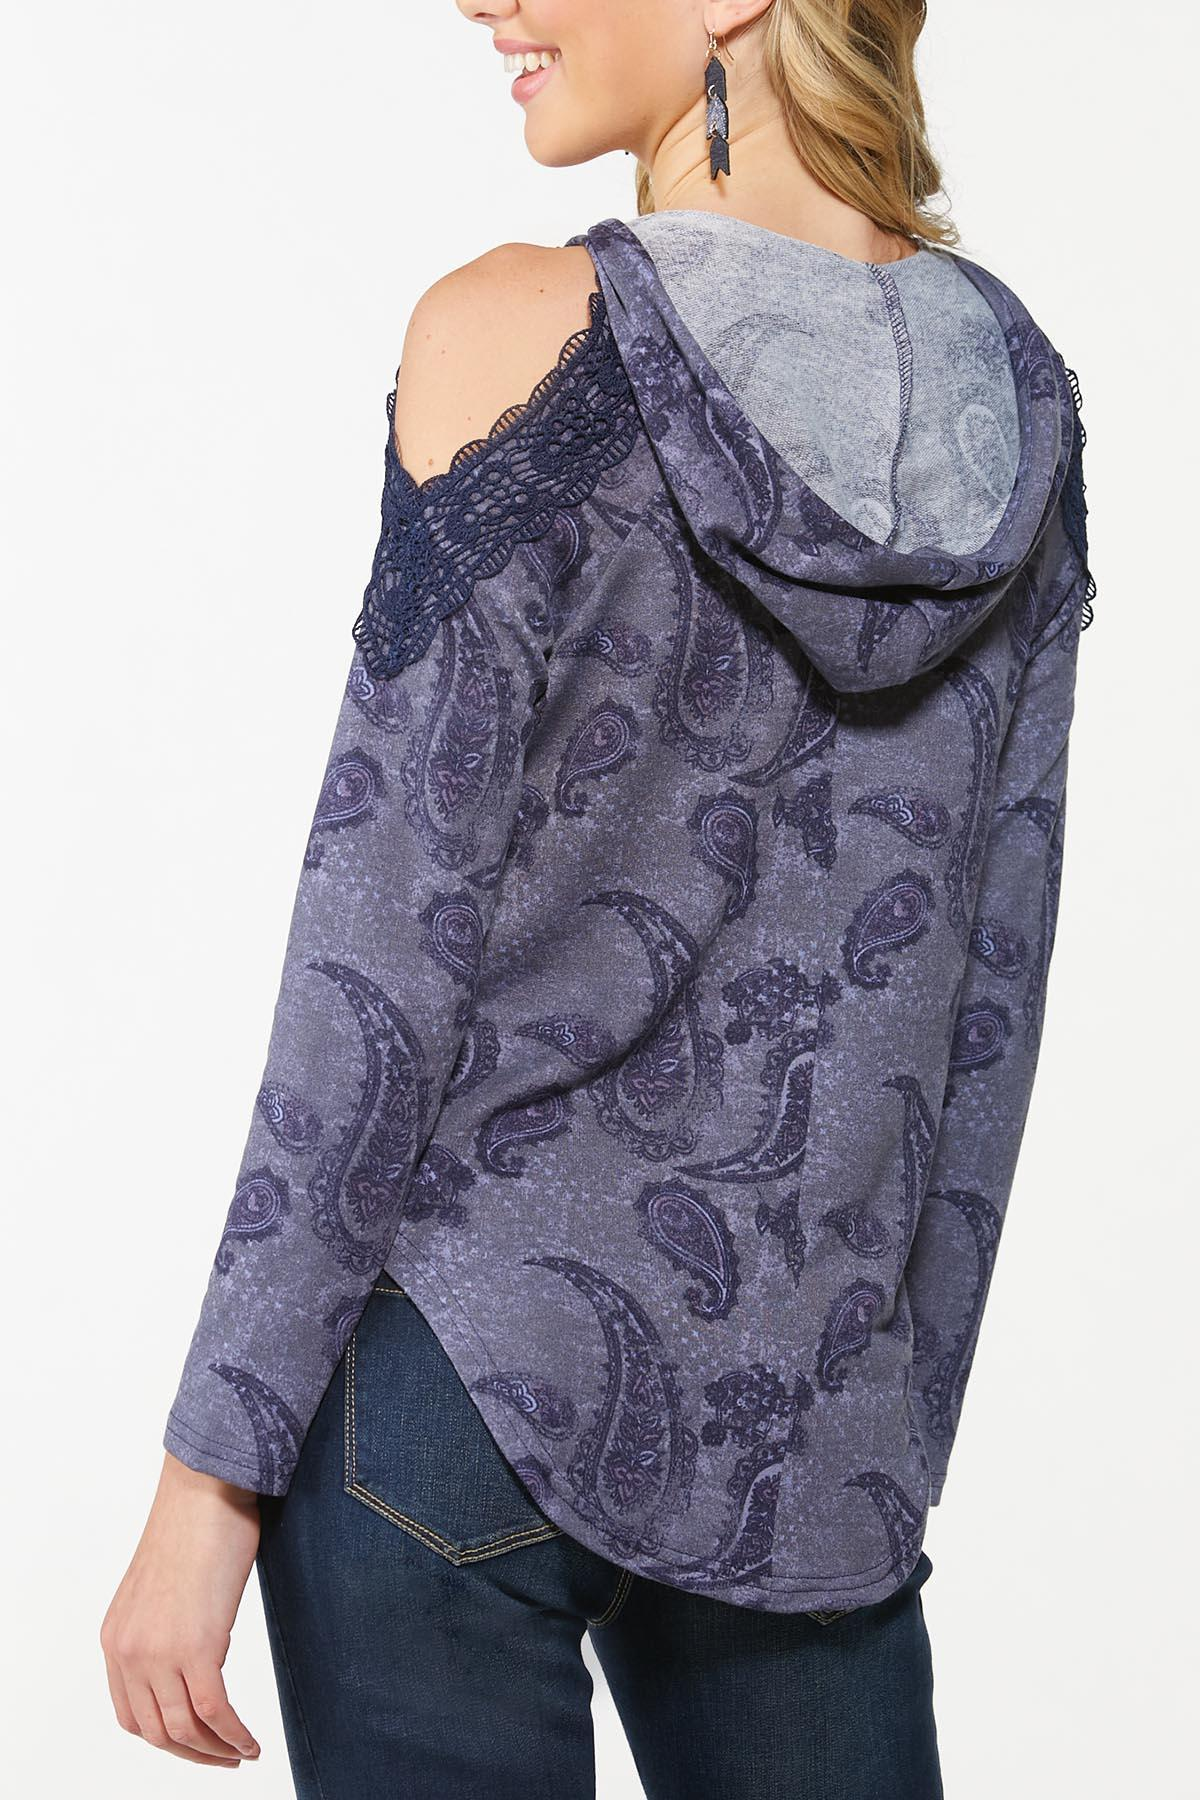 Lacy Paisley Cold Shoulder Top (Item #44711319)